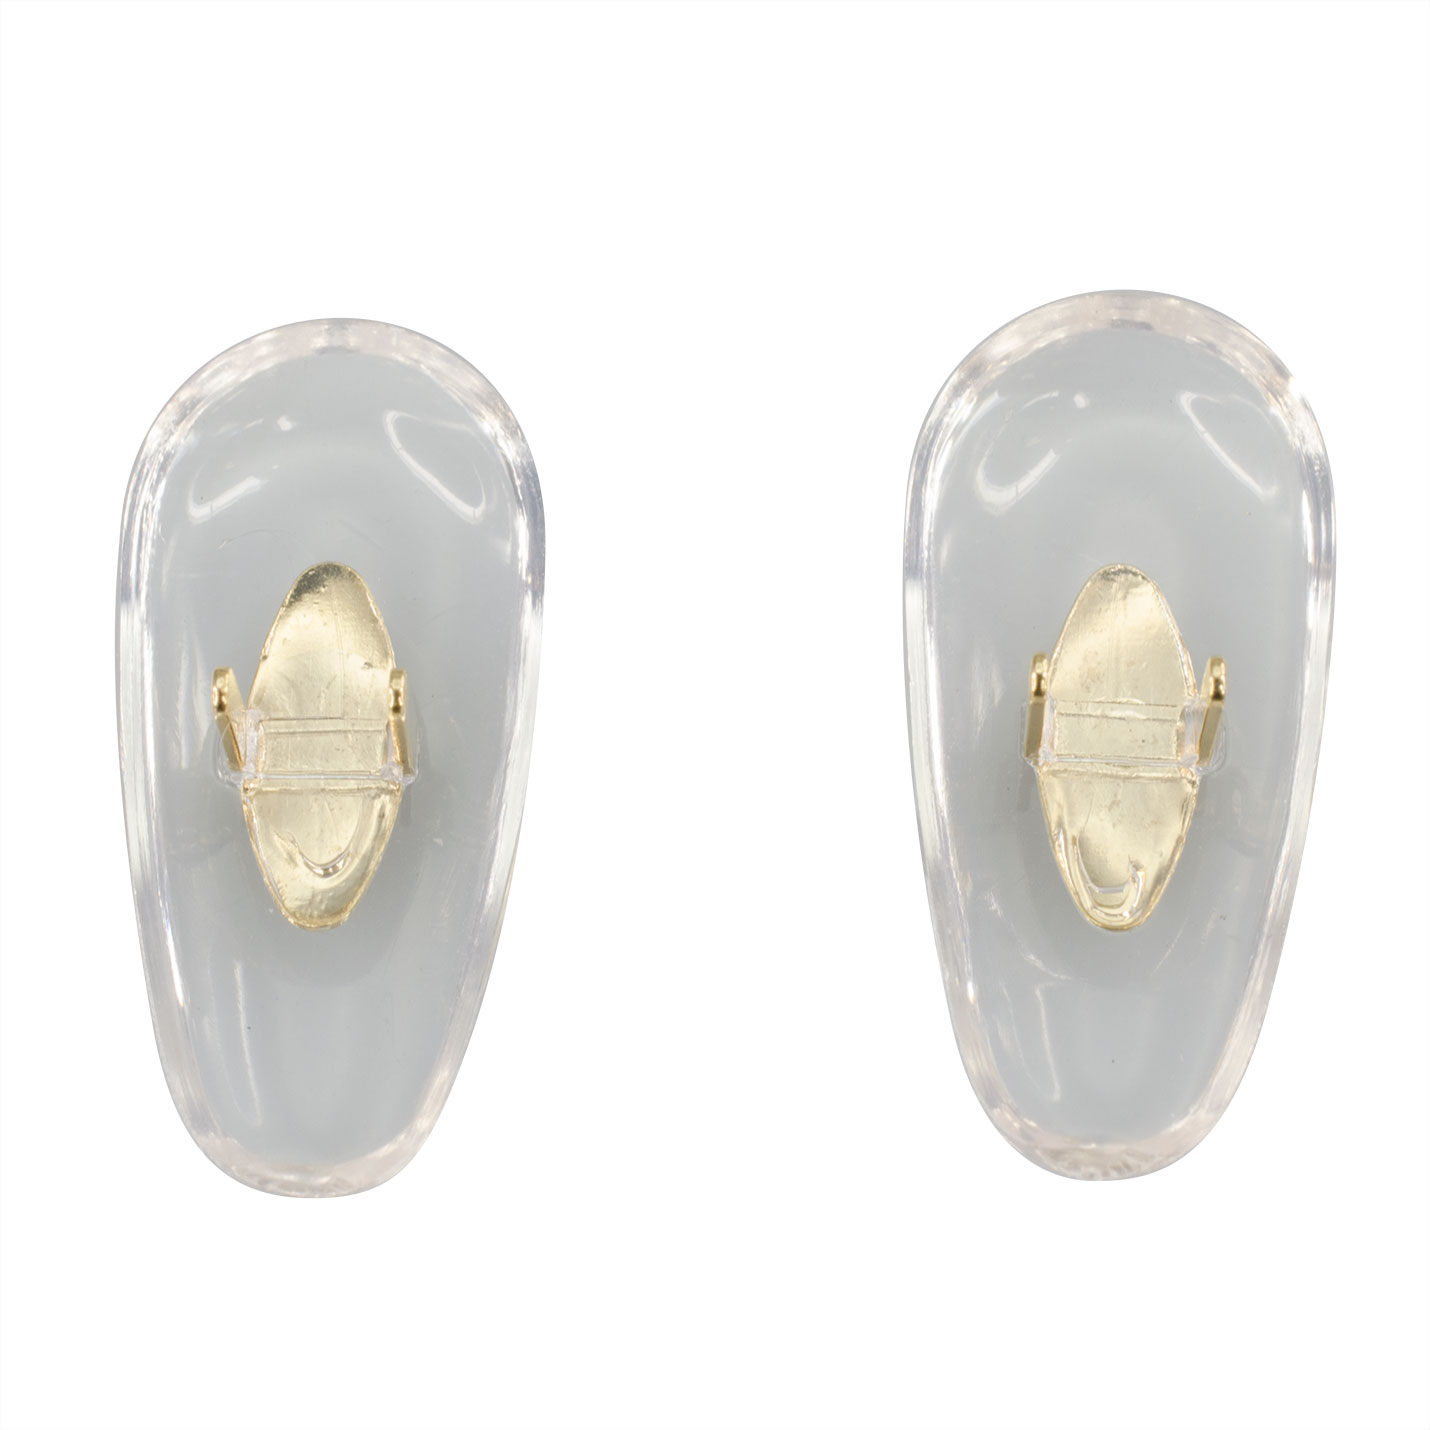 751a98933c 10 Pairs - High quality Crimp-On PVC Nose Pad